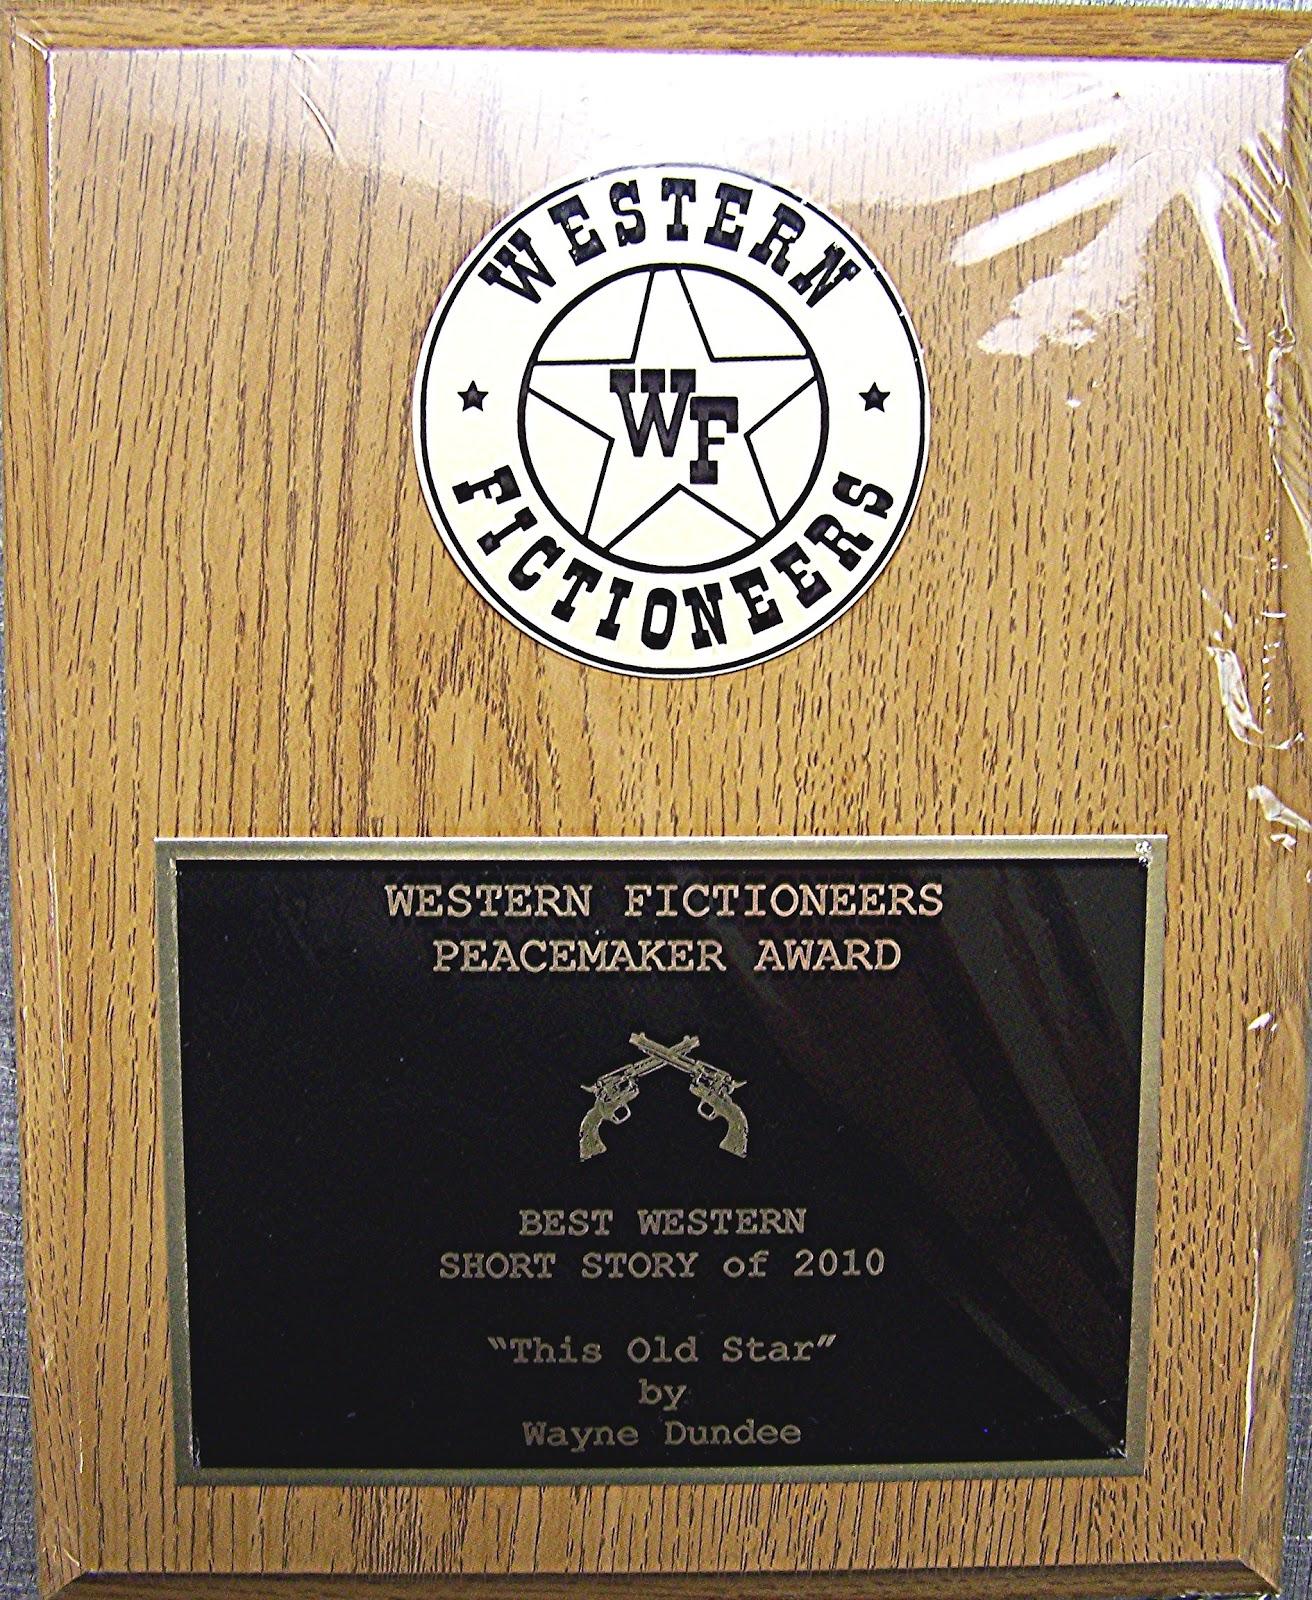 http://4.bp.blogspot.com/-YzRT7SJEdJM/T8irs-0TRAI/AAAAAAAAAZA/bAwqVdOlLAg/s1600/Peacemaker+award1.JPG